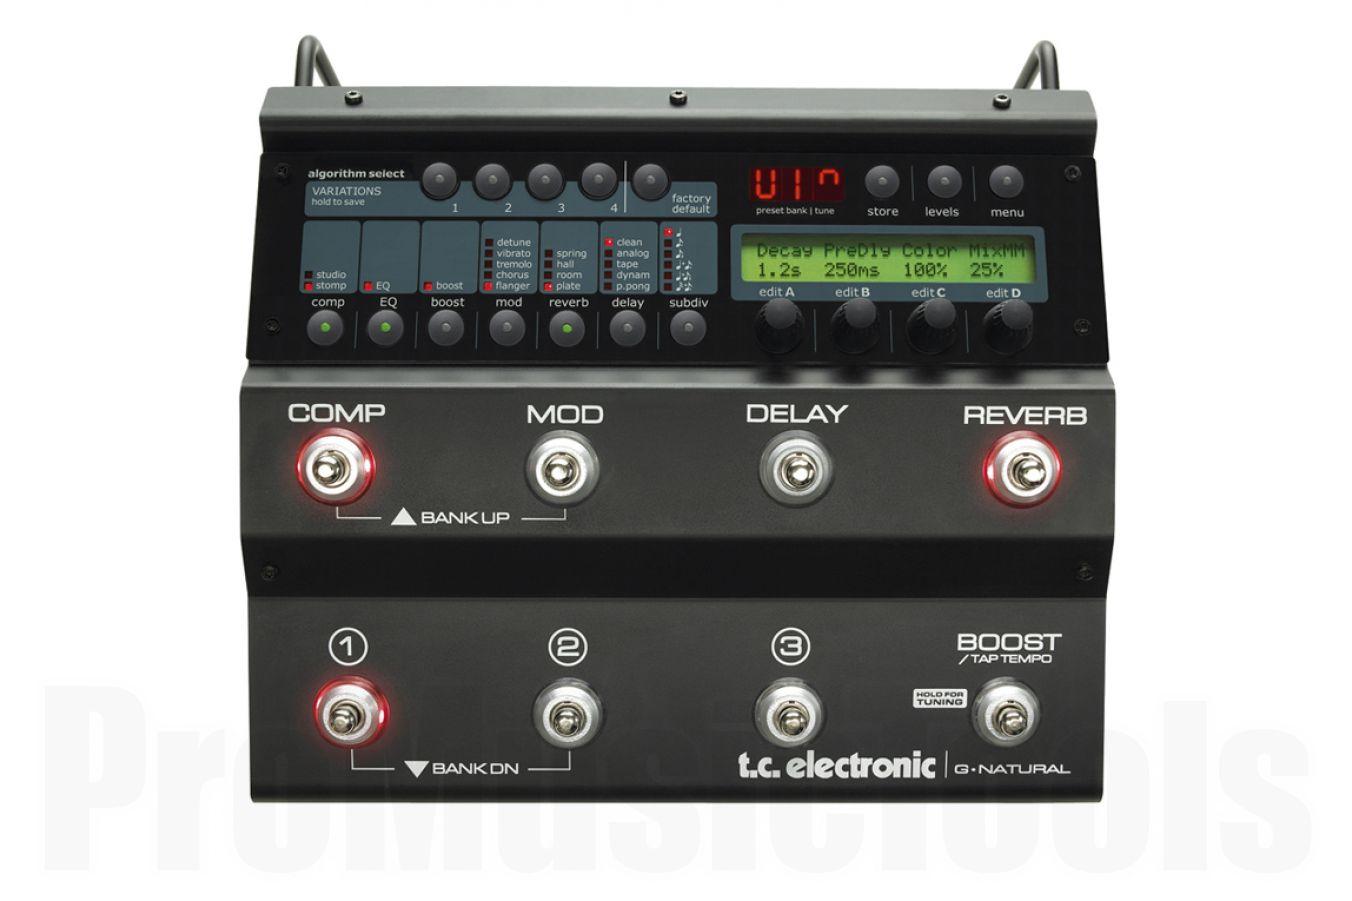 TC Electronic G-Natural - b-stock (1x opened box)